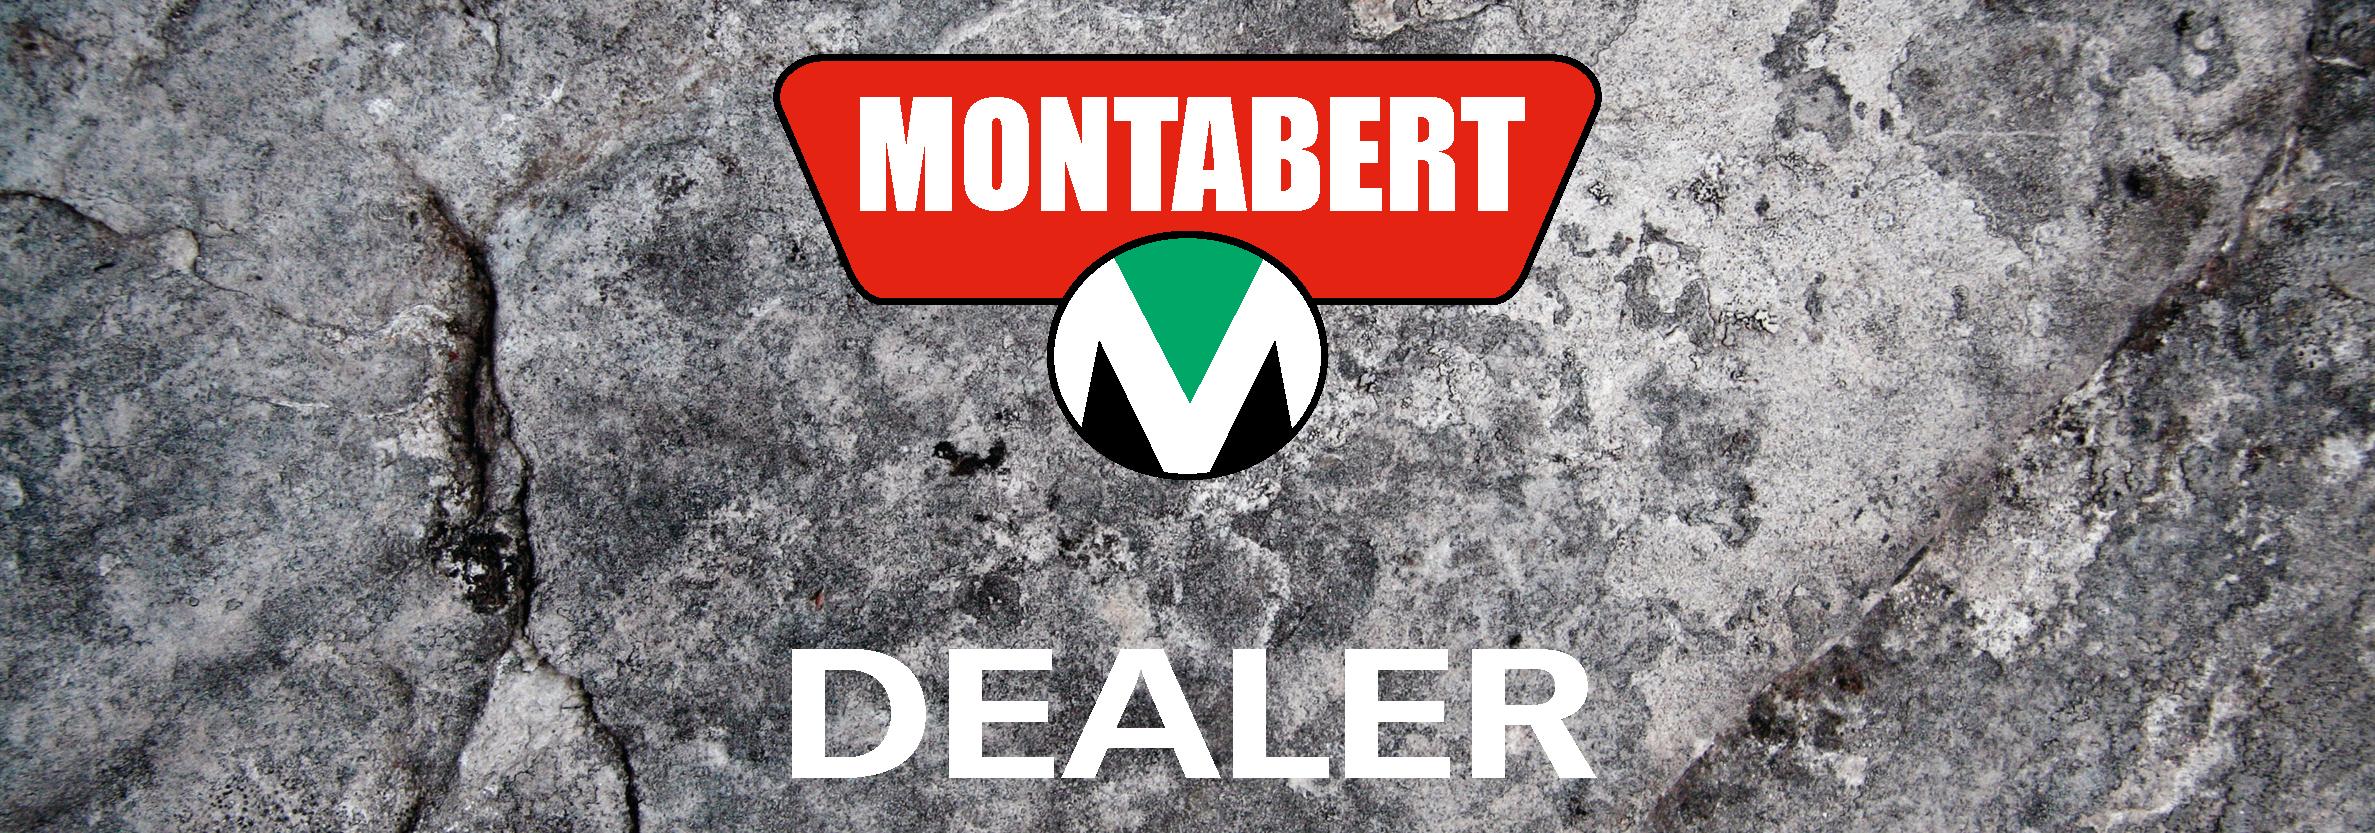 montabet dealer1